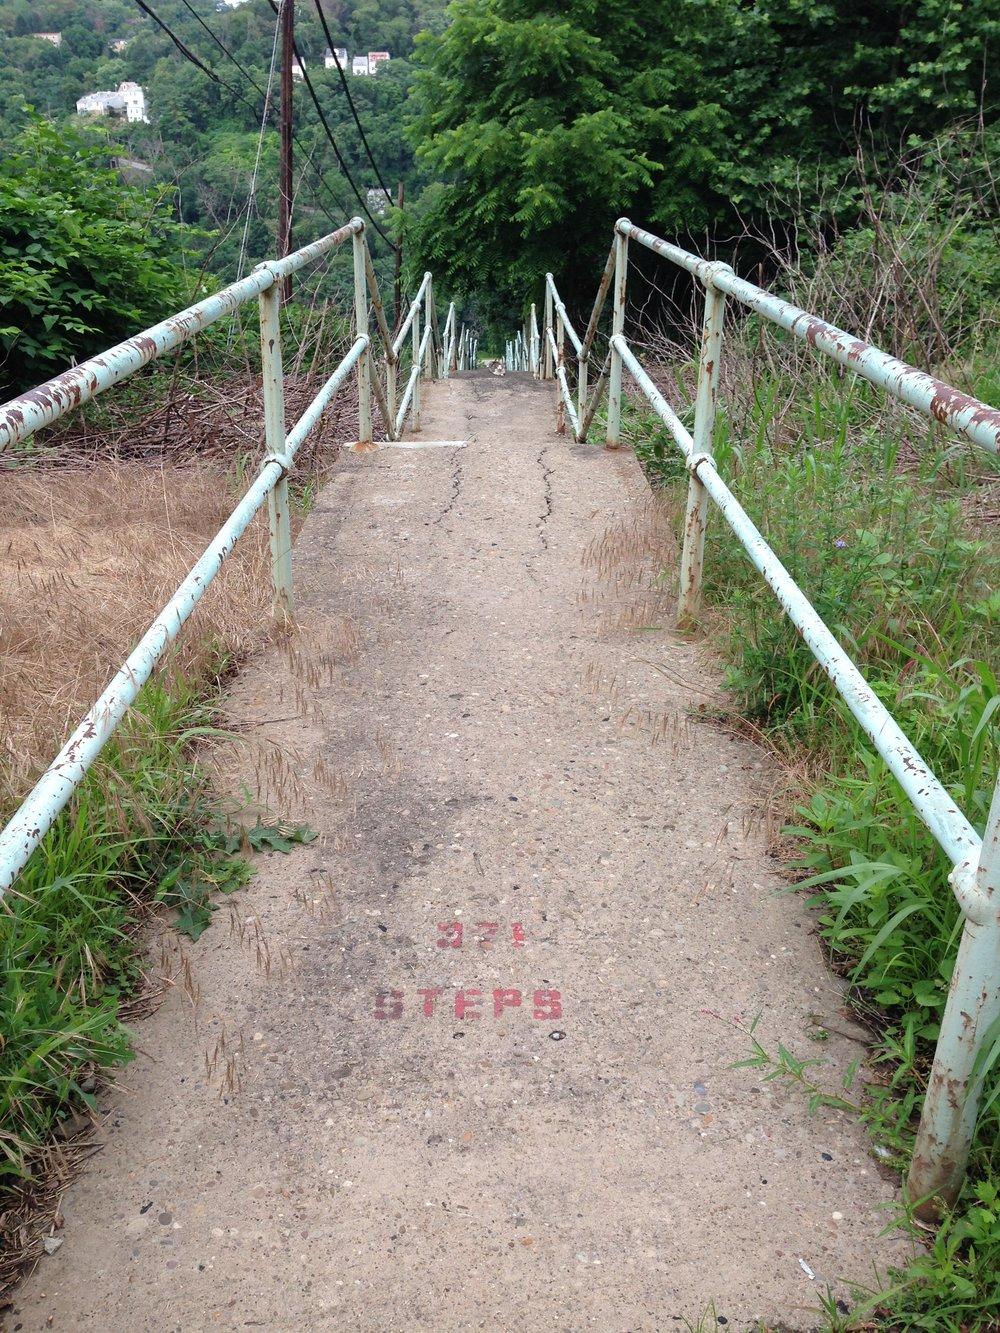 371 Steps